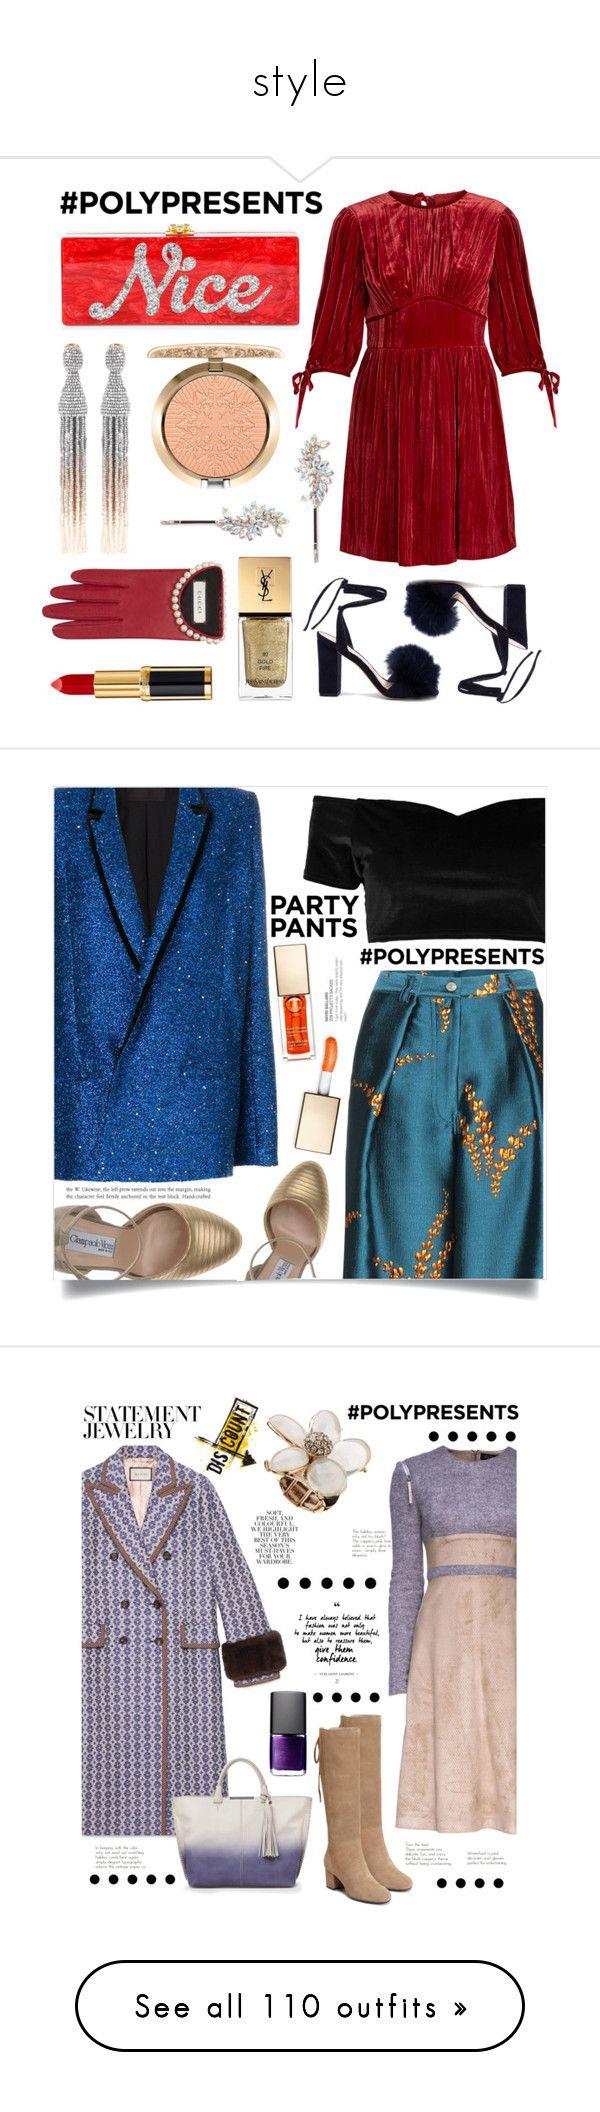 """style"" by andreiasemedo ❤ liked on Polyvore featuring Loeffler Randall, Edie Parker, Oscar de la Renta, Balmain, Yves Saint Laurent, MAC Cosmetics, Gucci, Forever 21, AlexaChung and polyPresents"